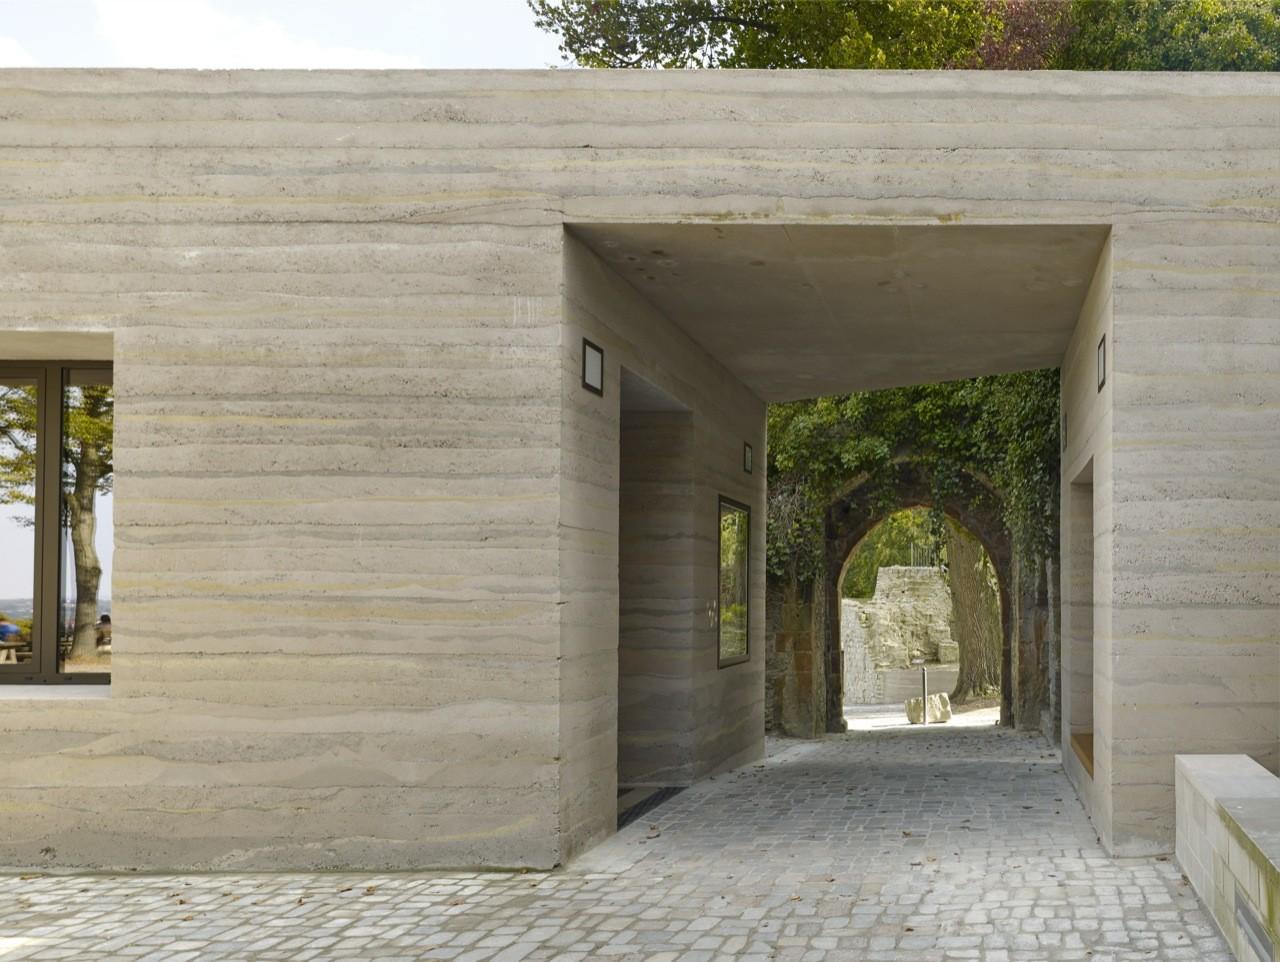 Centro de visitantes Sparrenburg  / Max Dudler, © Stefan Müller